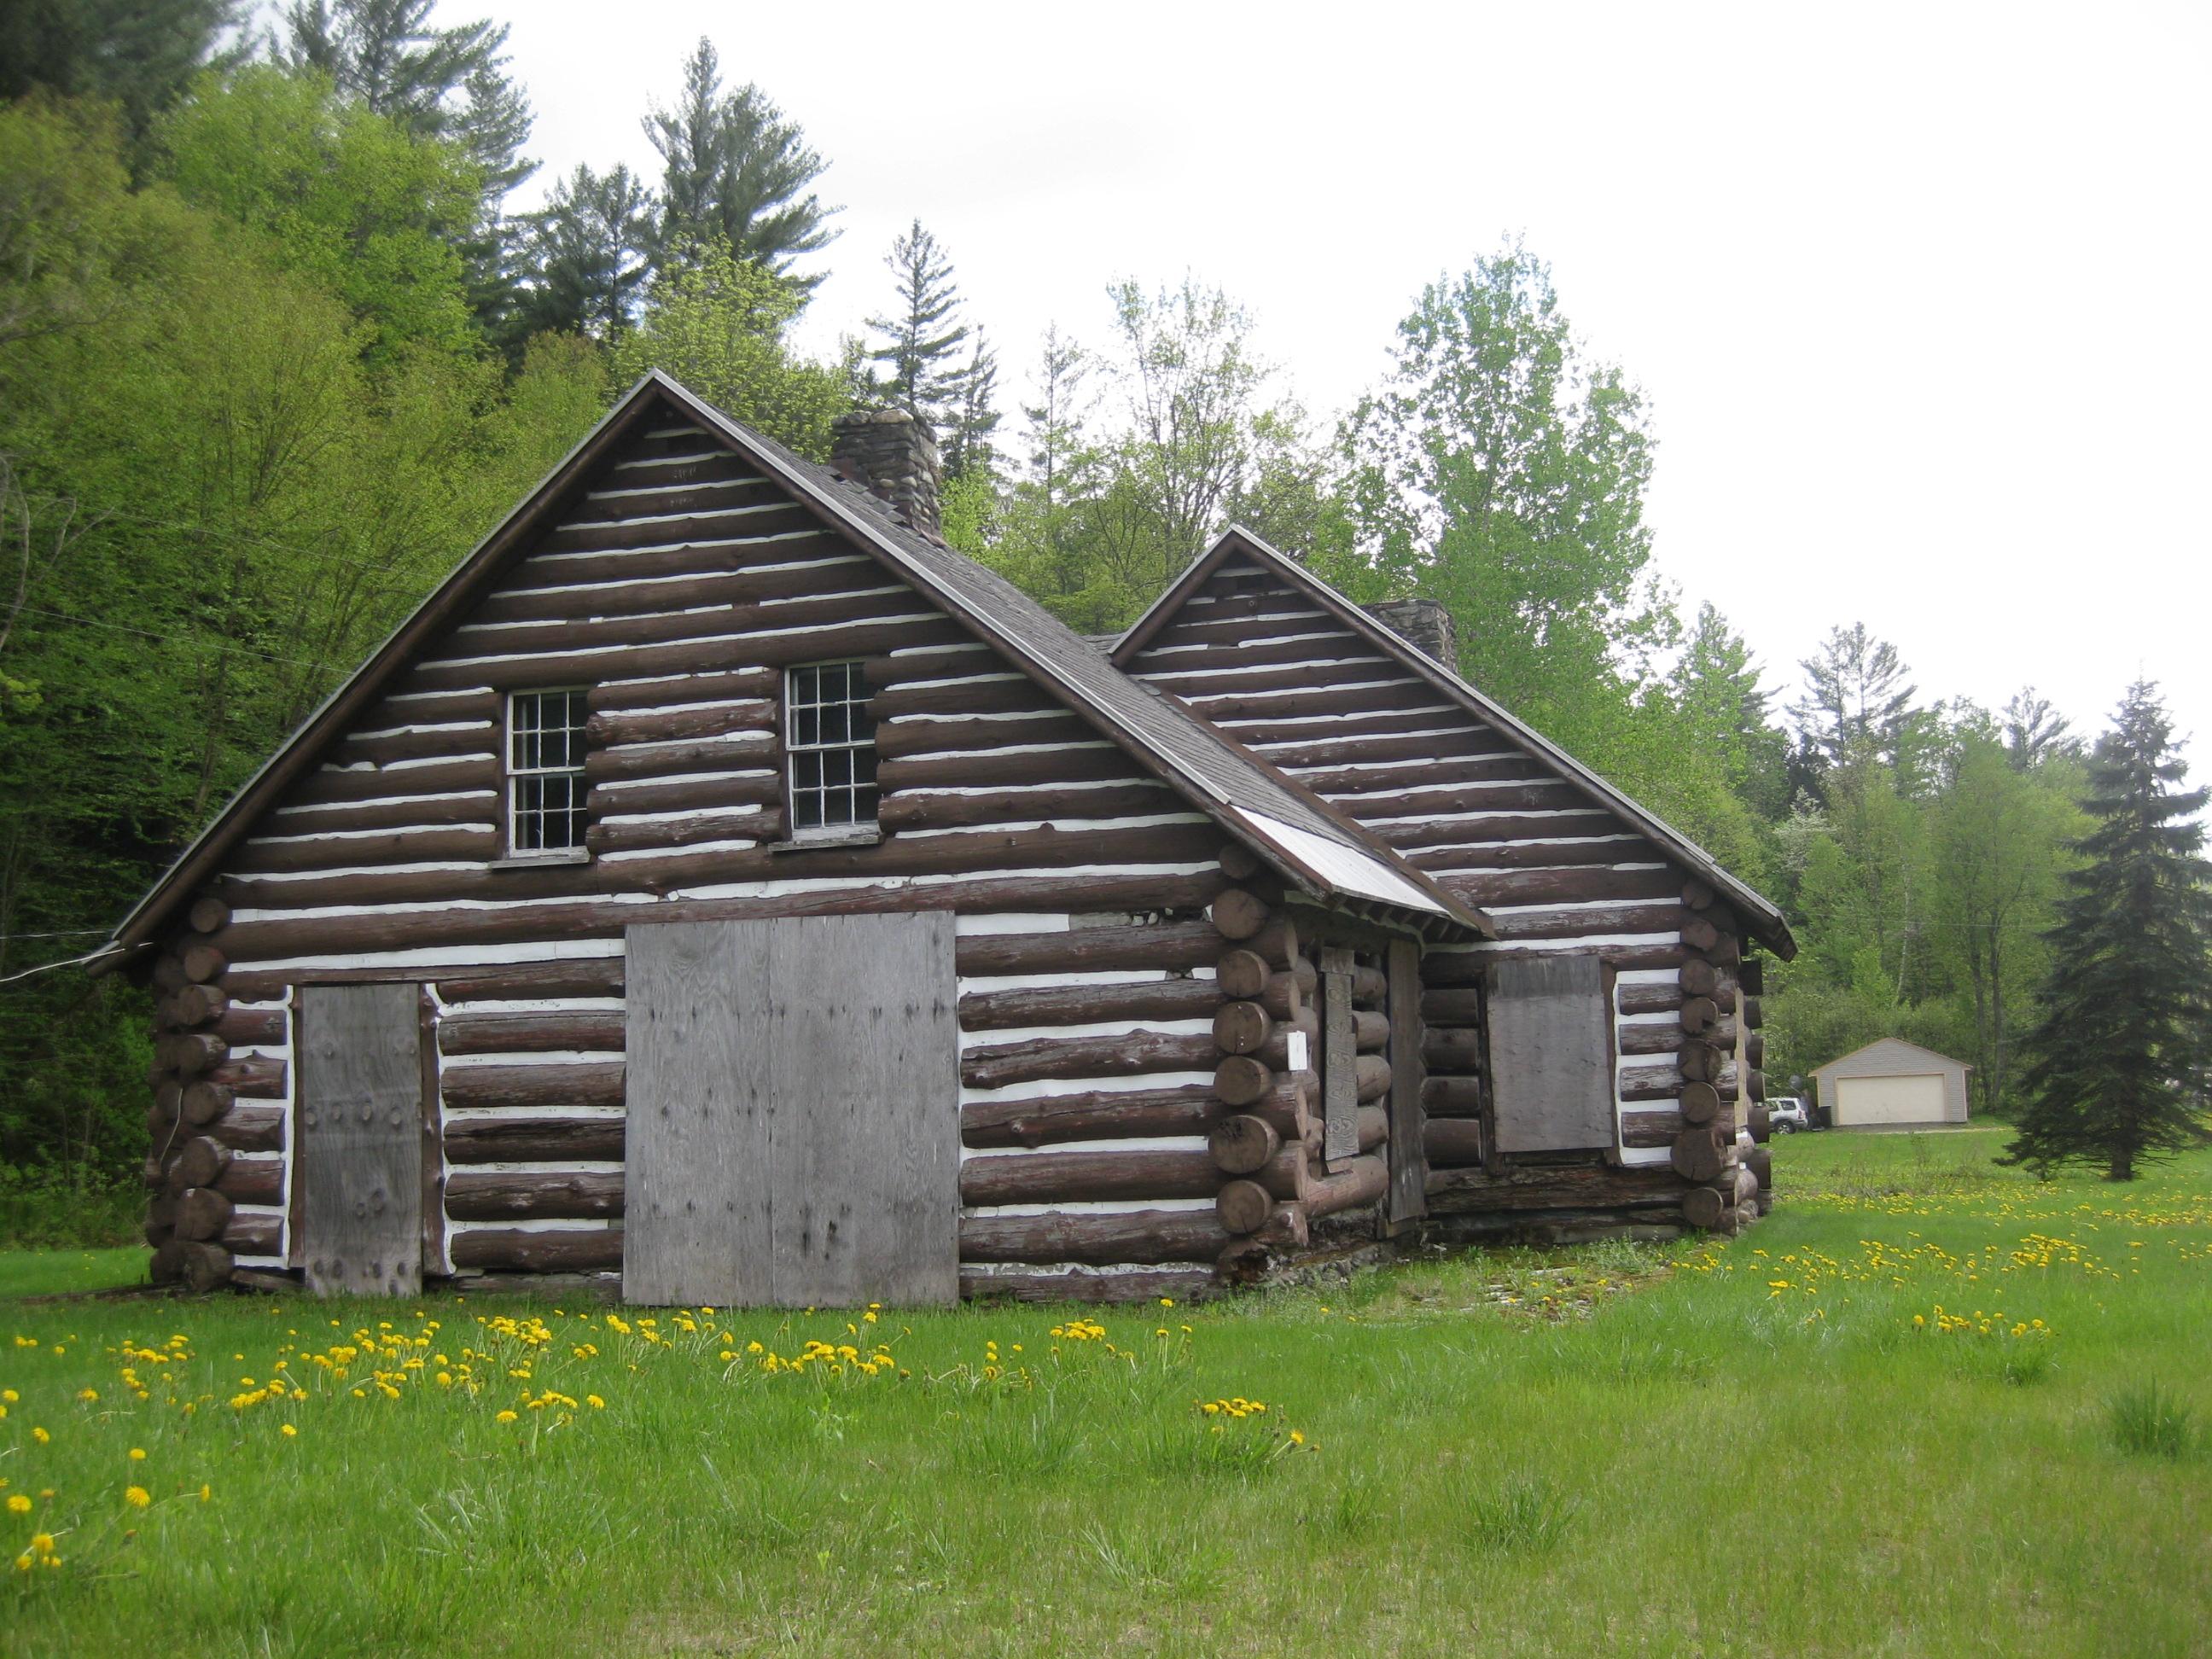 Abandoned Vermont Log Cabin Motel Preservation In Pink